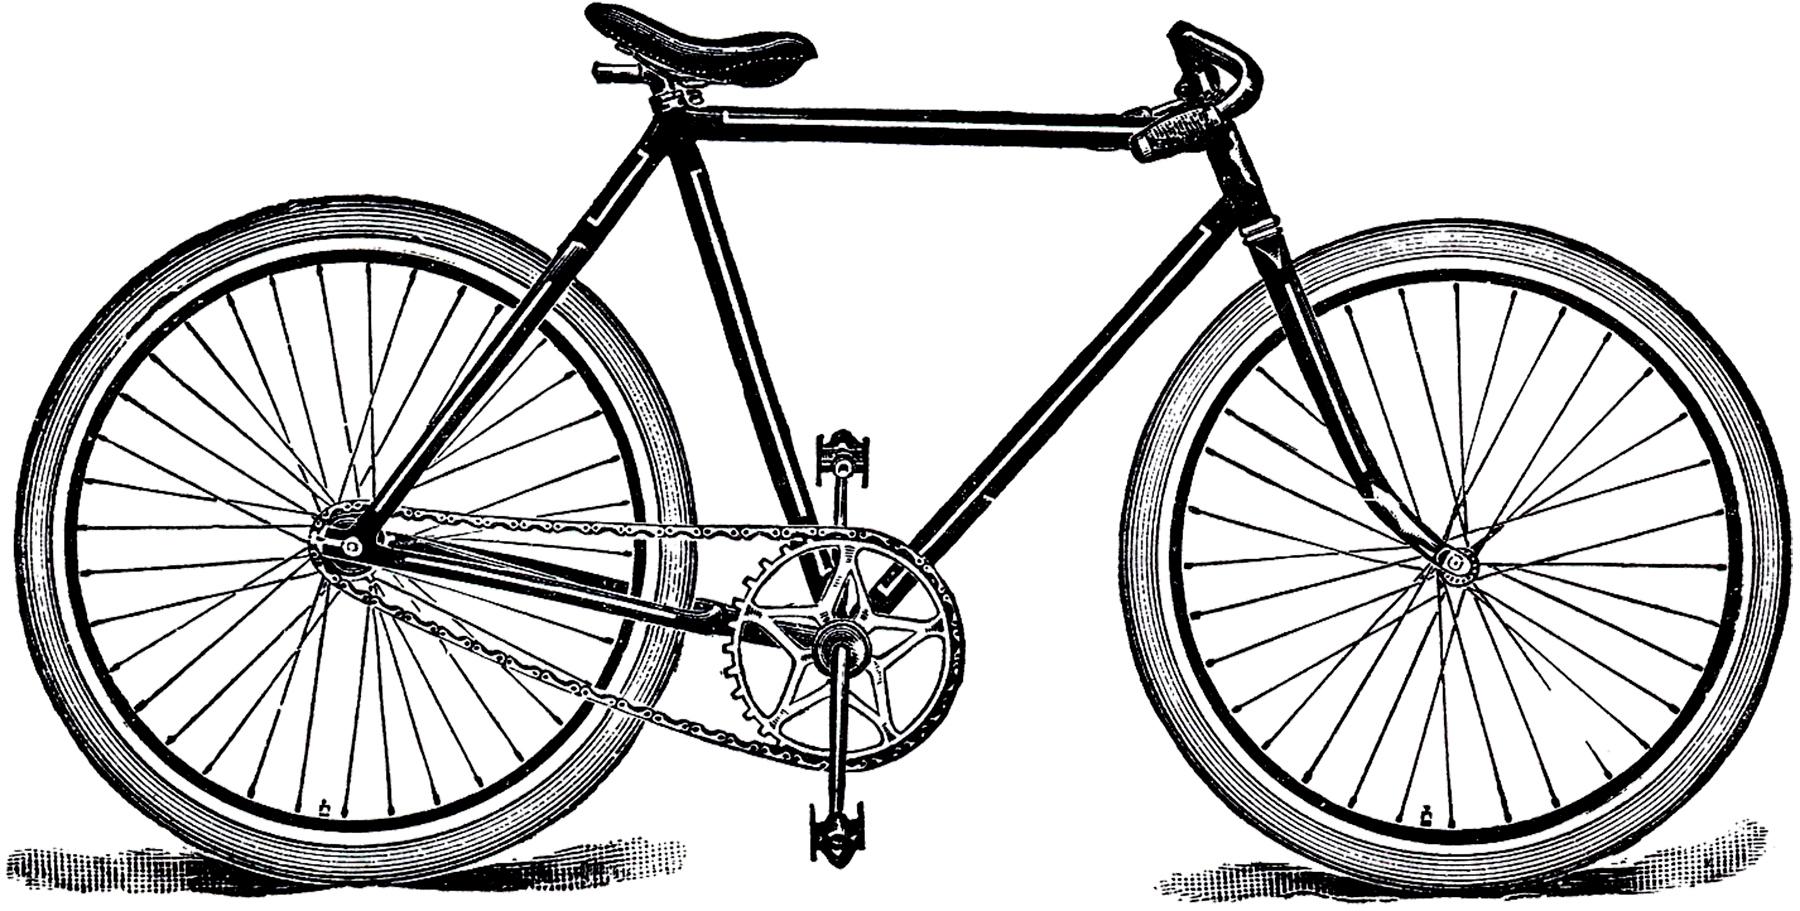 Free Public Domain Bicycle Image